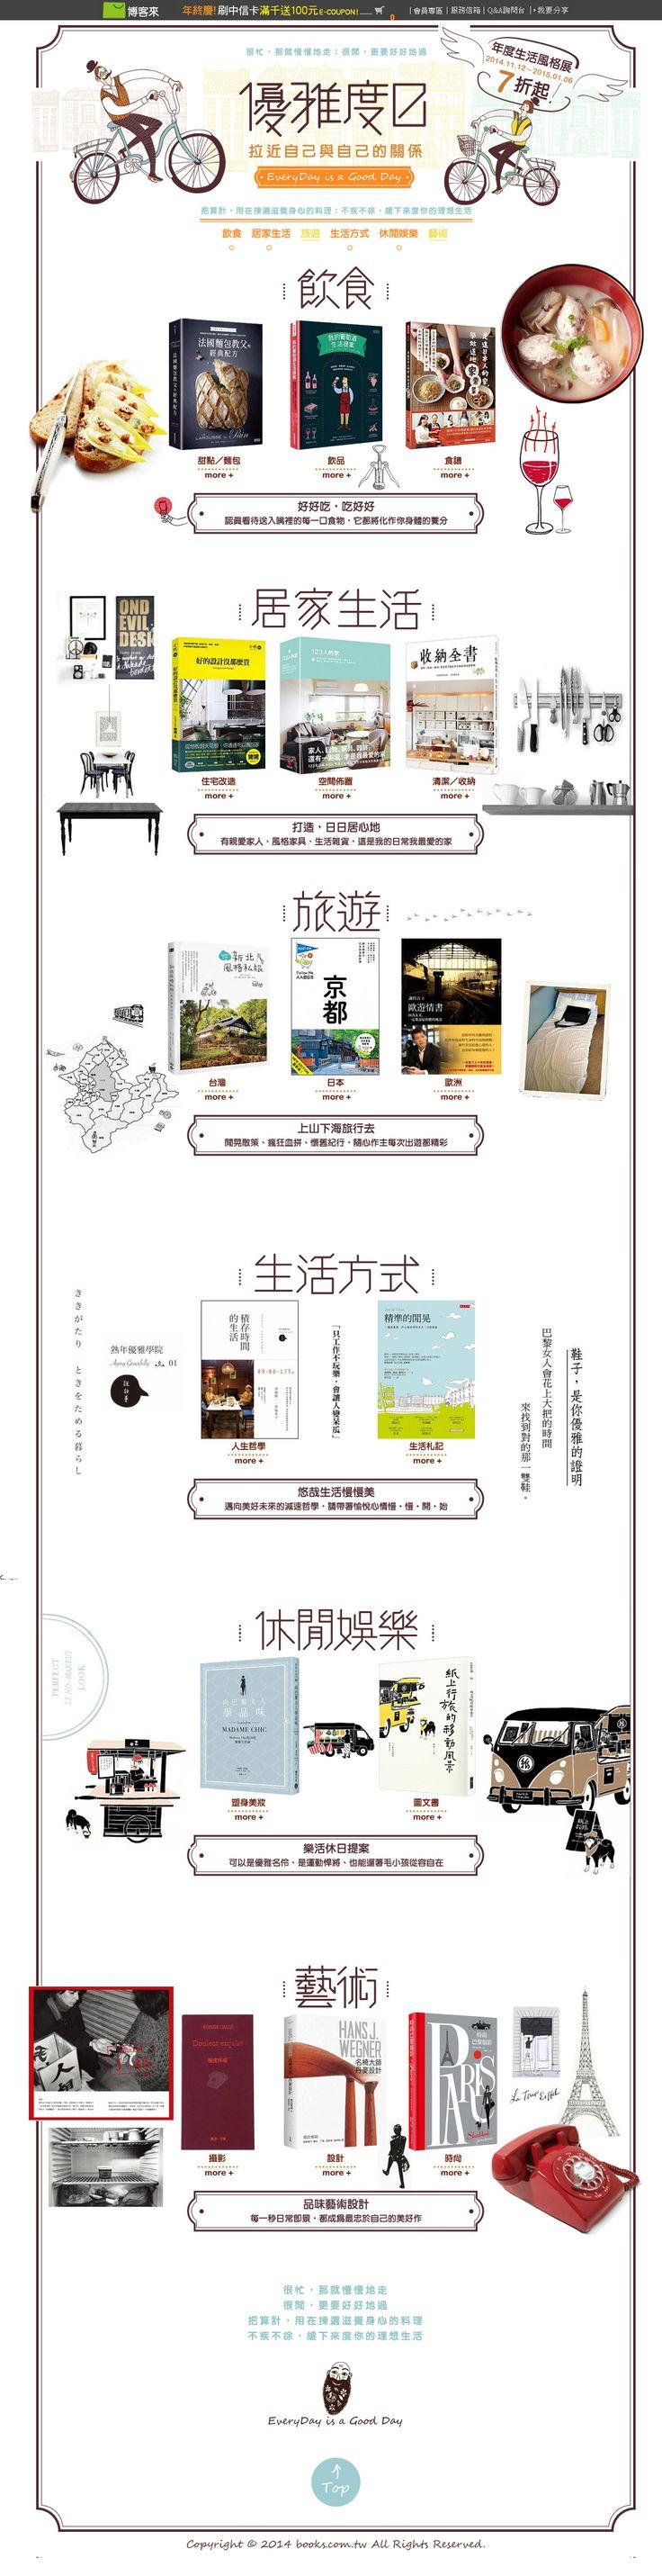 優雅度日,拉近自己與自己的關係,EveryDay is a Good Day!博客來年度生活風格書展7折起,2014.11.12~2015.01.06 http://www.books.com.tw/activity/2014/11/elegant/index.html?loc=banner_001